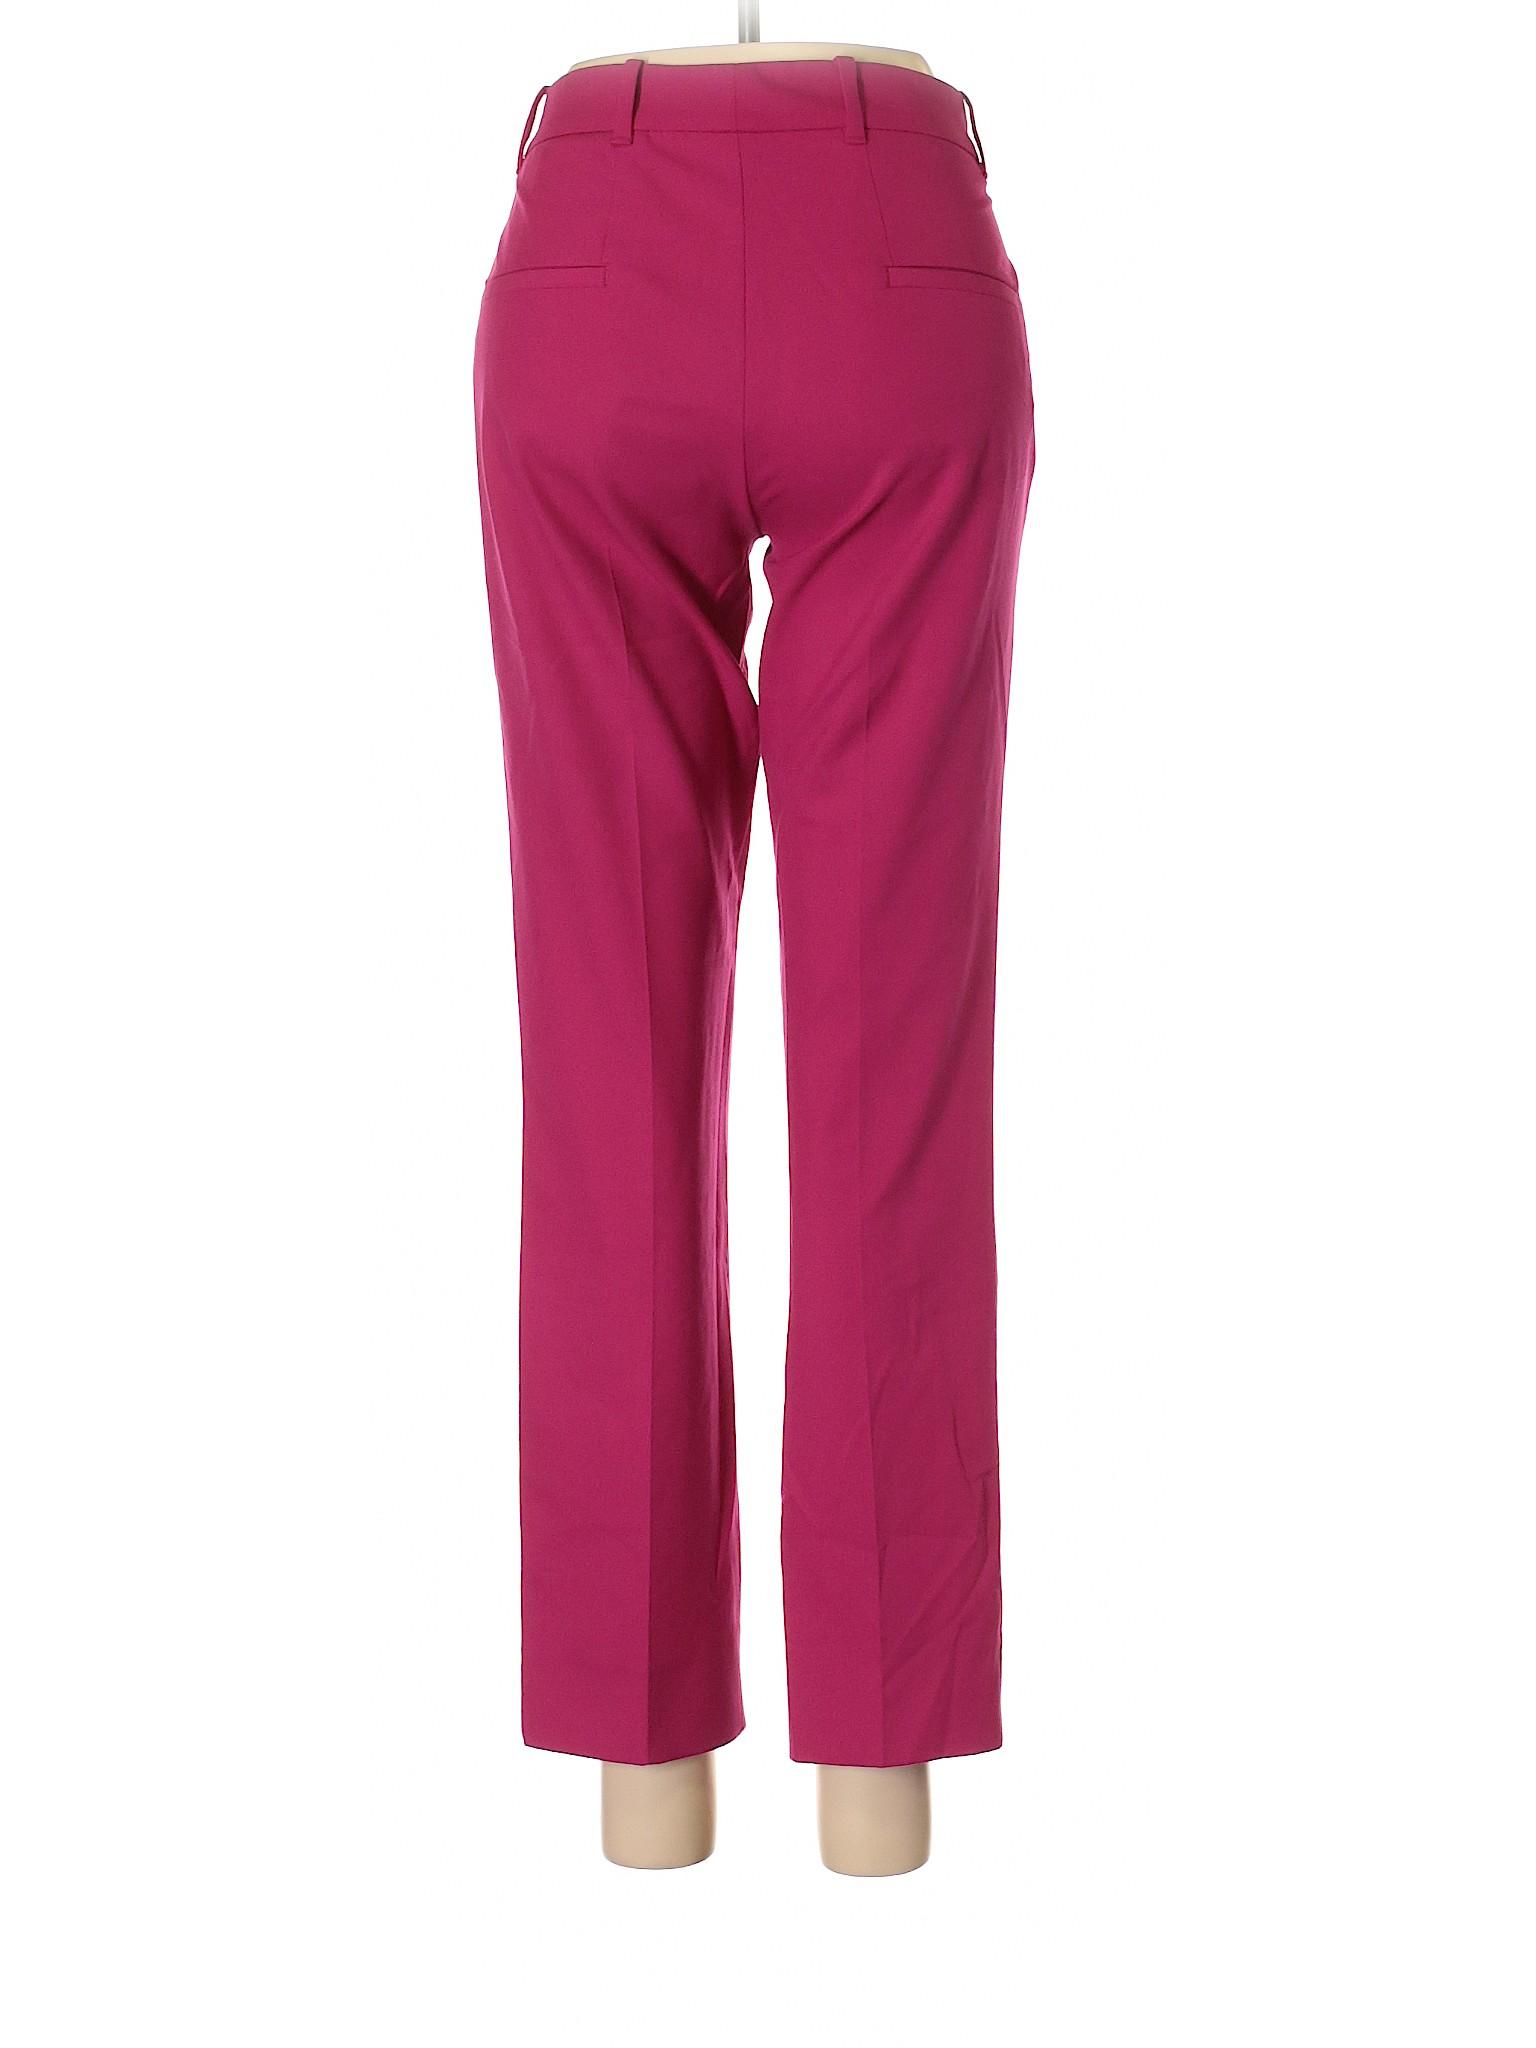 Boutique Leisure Leisure Zara Zara Dress Dress Pants Boutique rR1wrqC